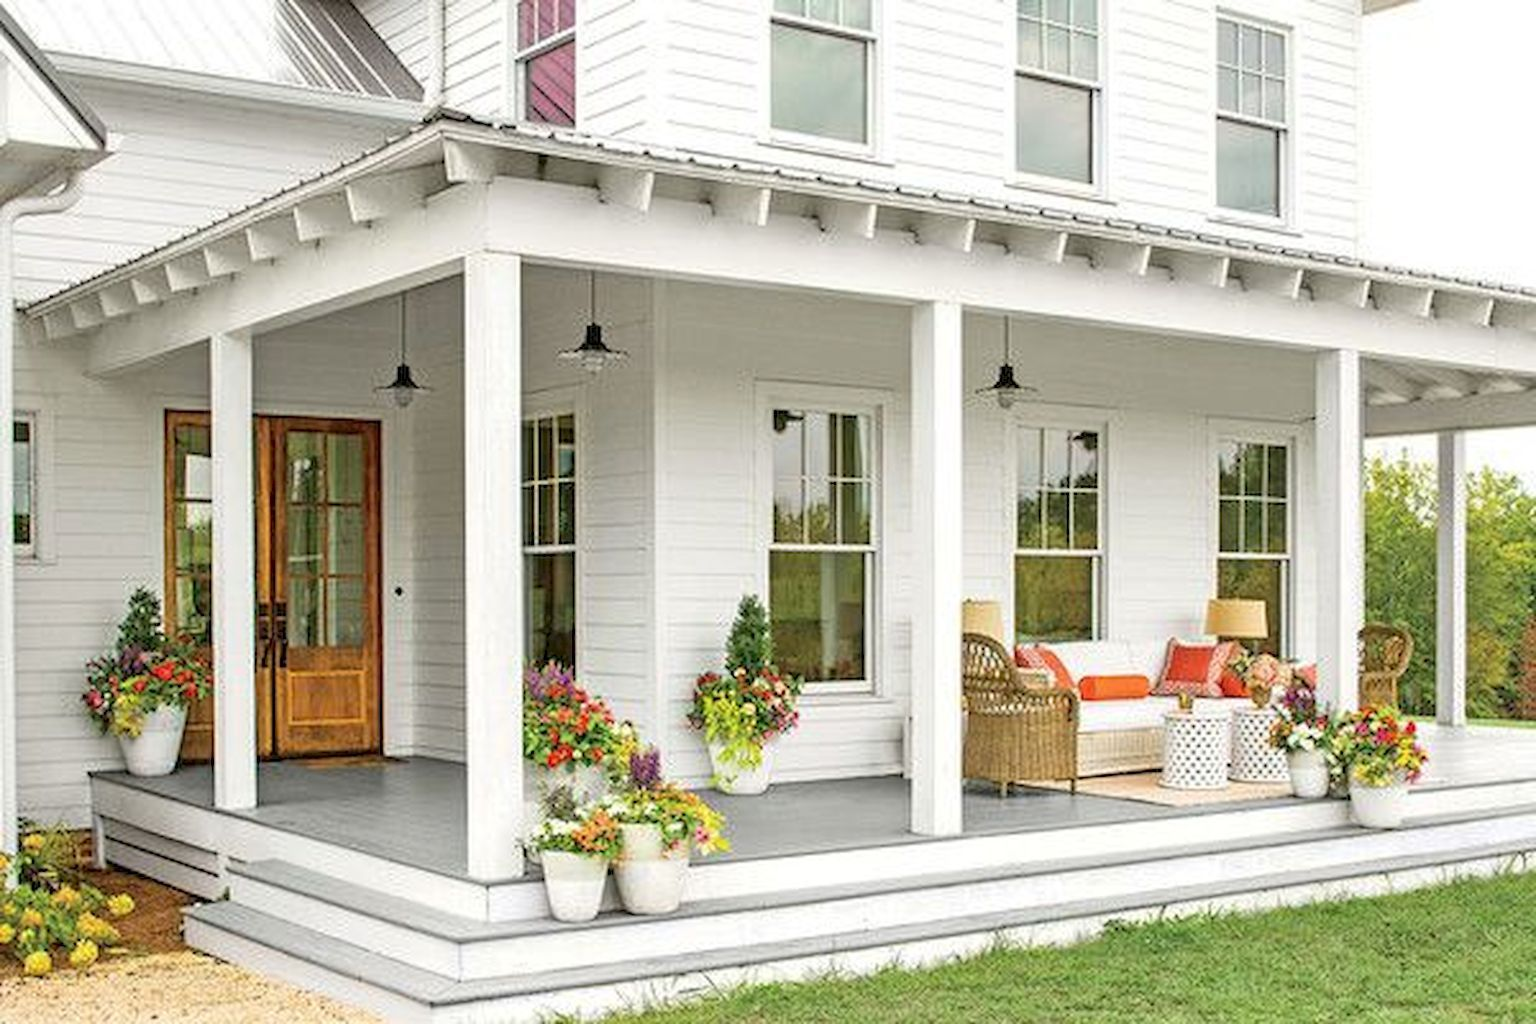 65 Stunning Farmhouse Porch Railing Decor Ideas 9 Porch Makeover Farmhouse Front Porches Porch Steps